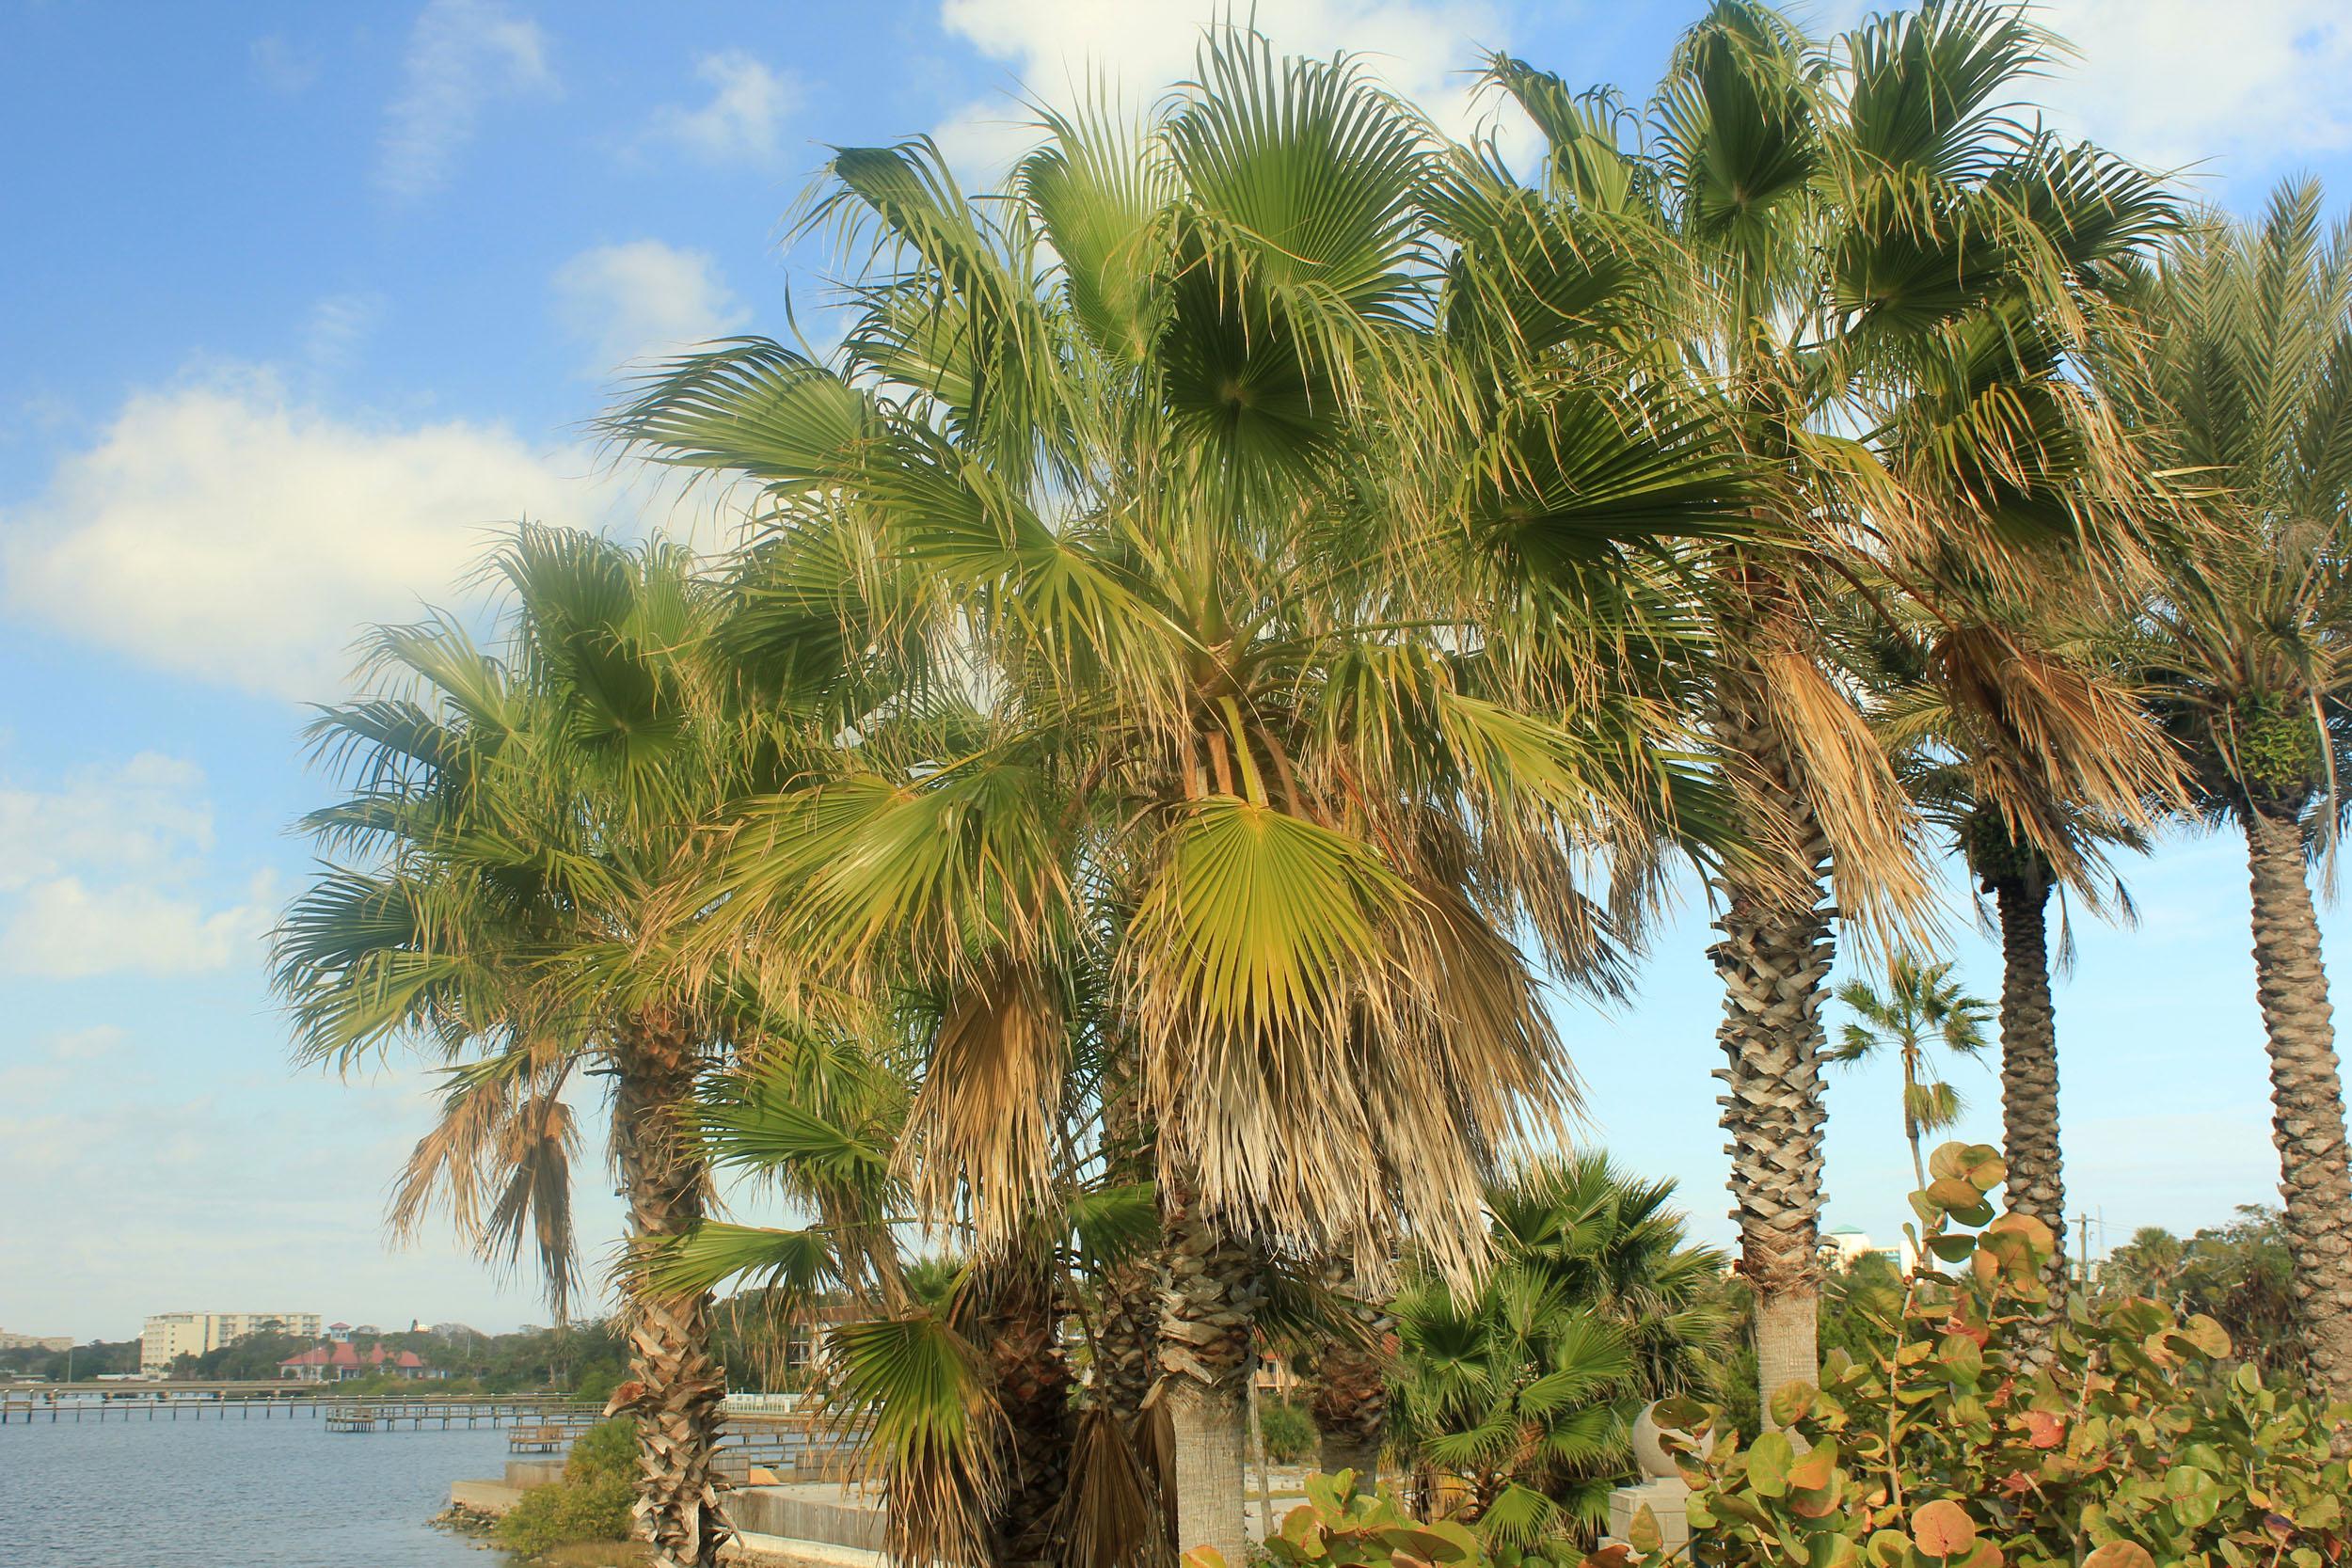 palm trees image free stock photo public domain photo cc0 images